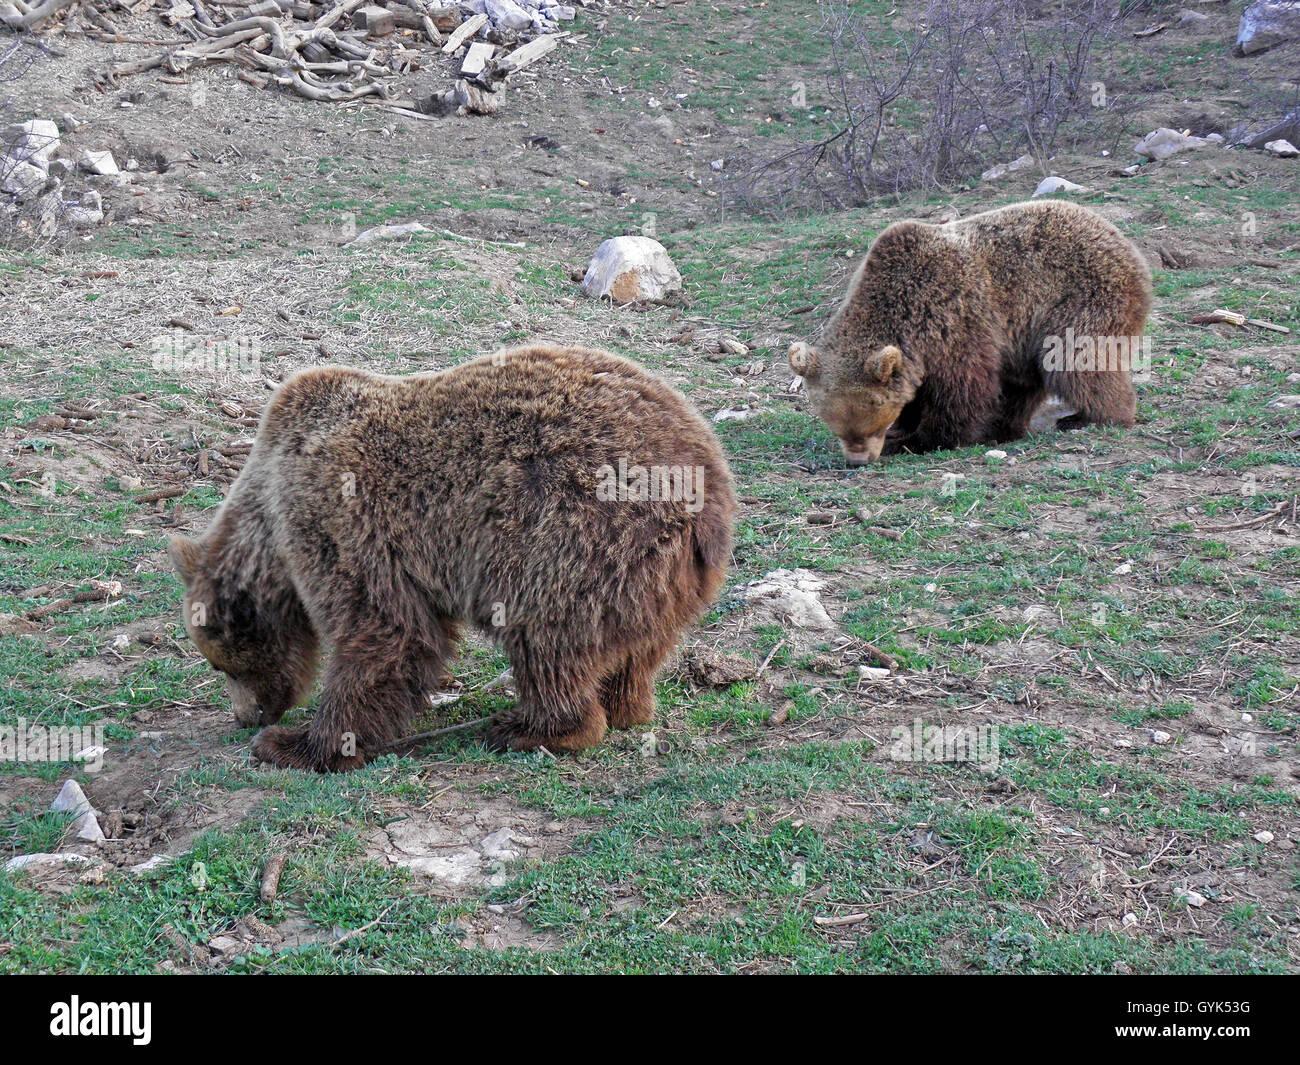 Kuterevo,refugee camp for young bears,Lika,Croatia,Europe,8 - Stock Image